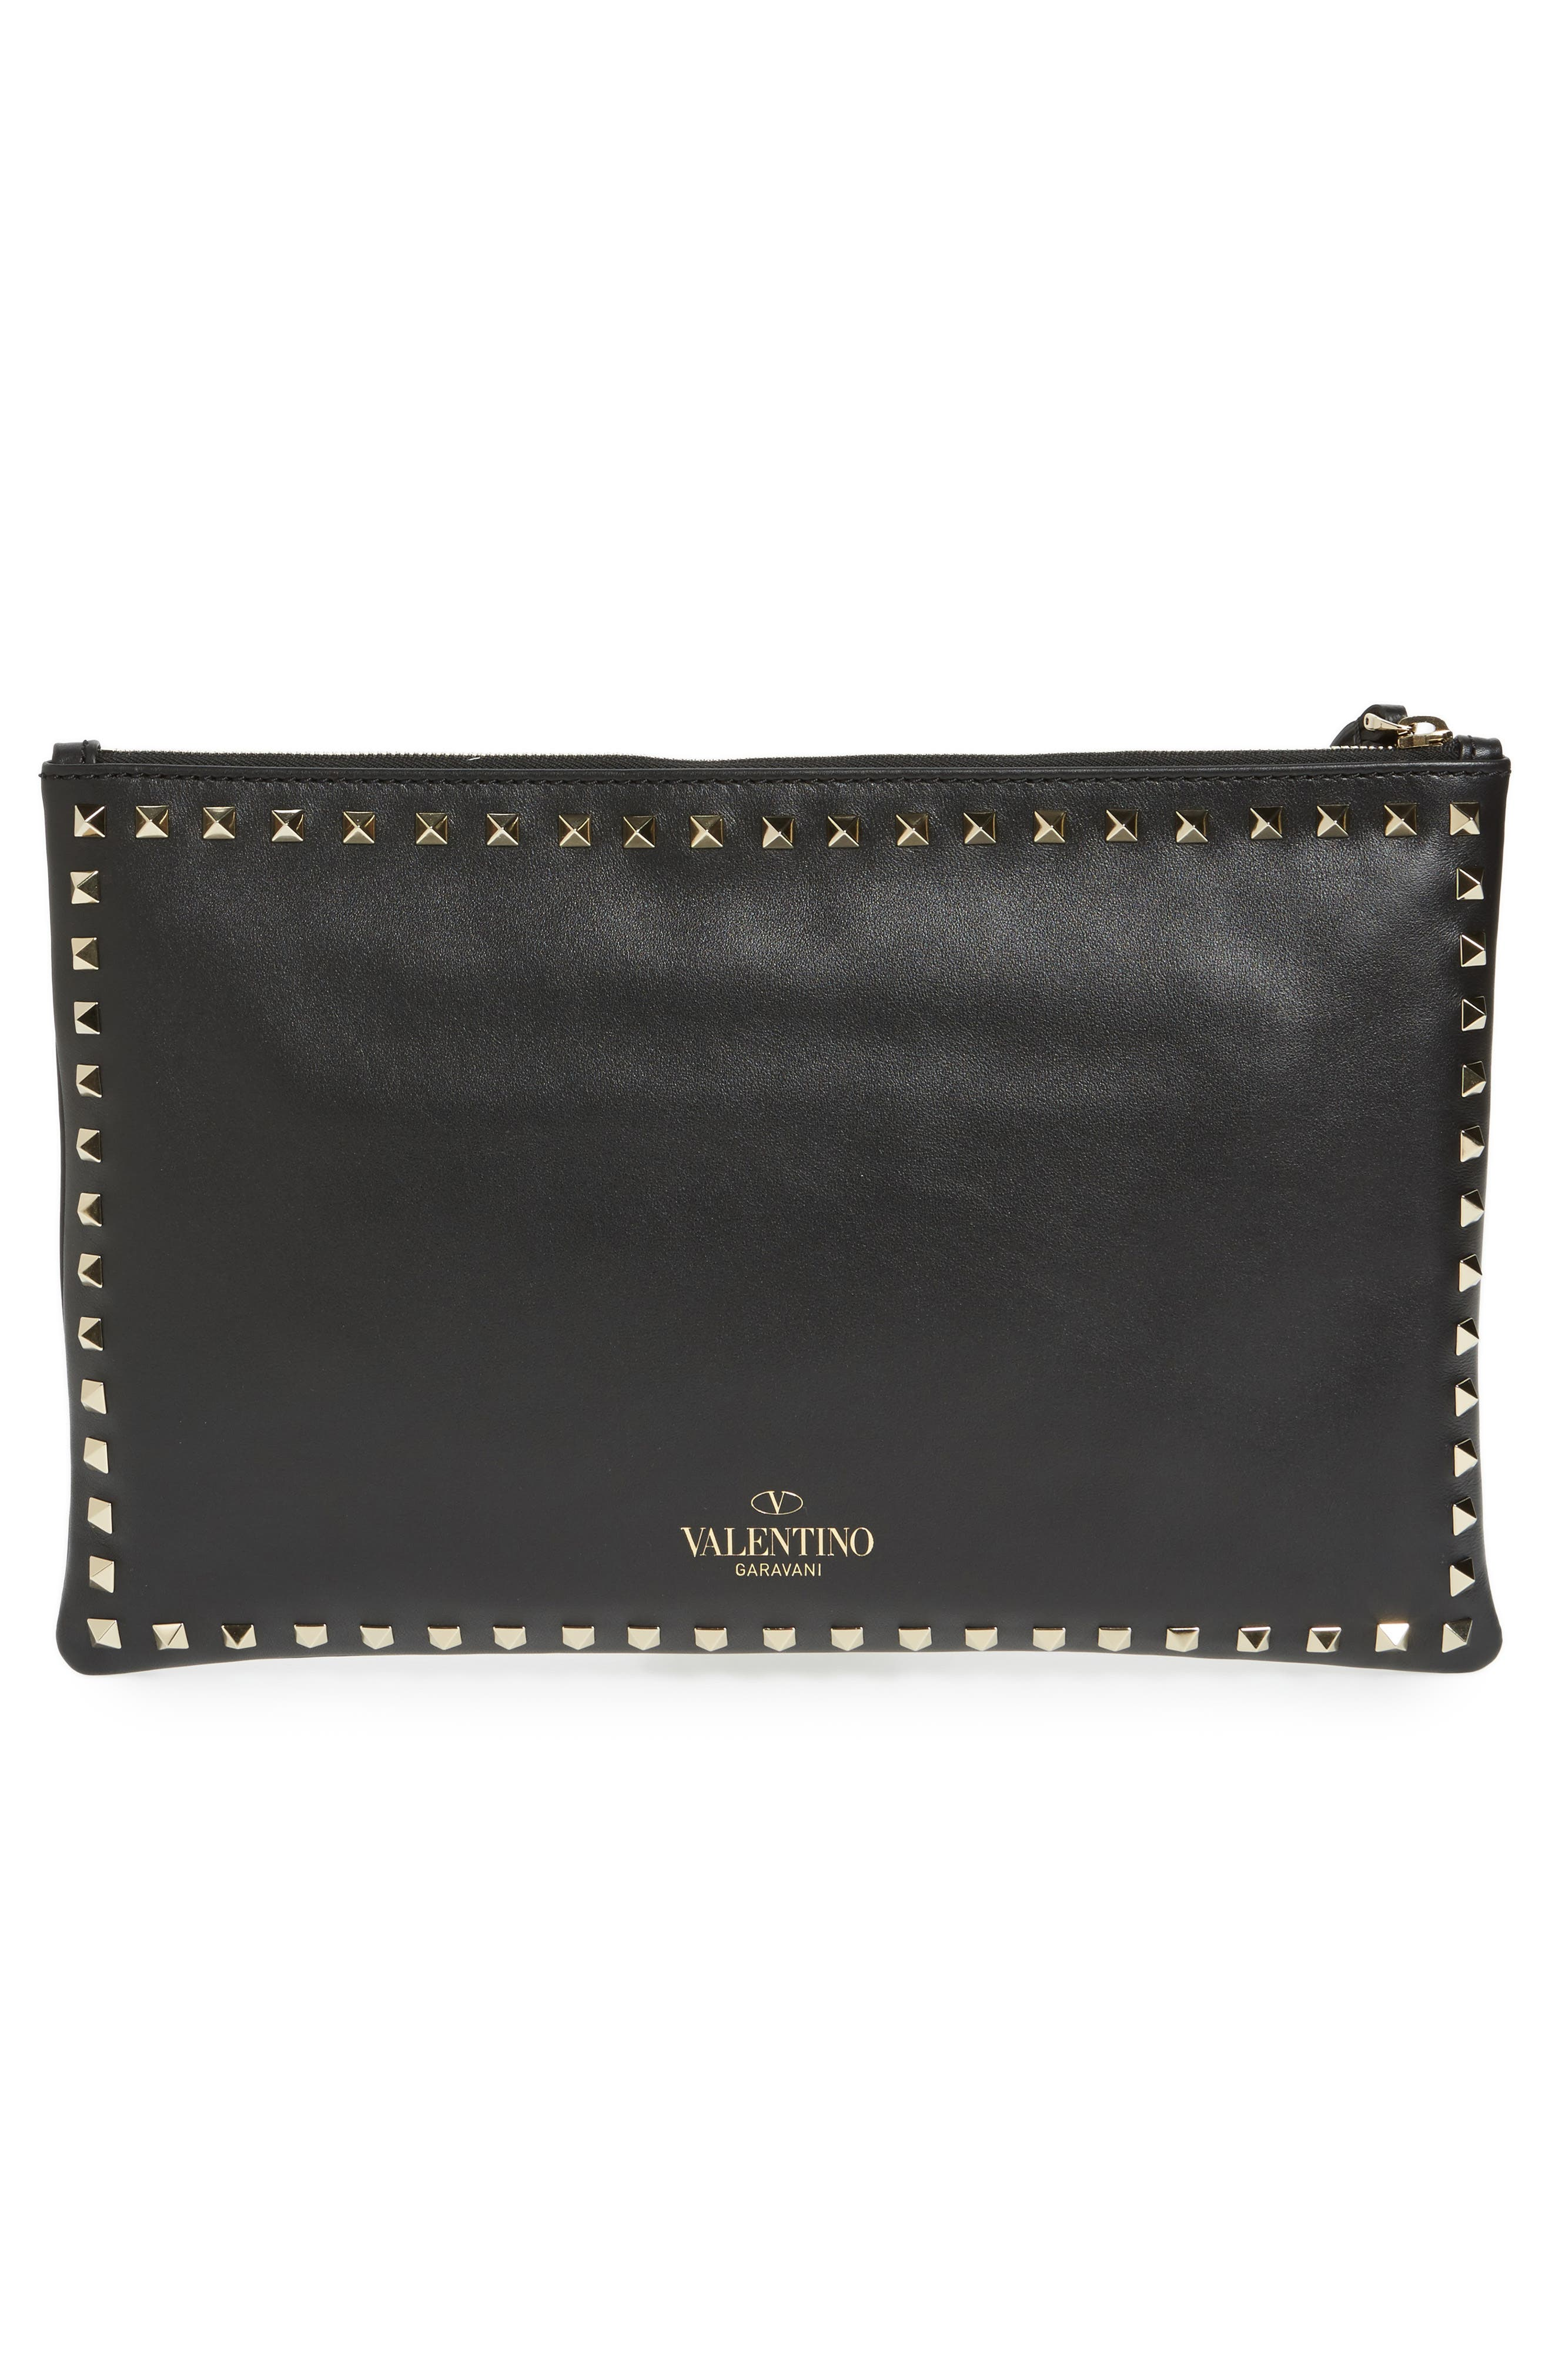 Valentino Small Rockstud Vitello Leather Clutch,                             Alternate thumbnail 4, color,                             001